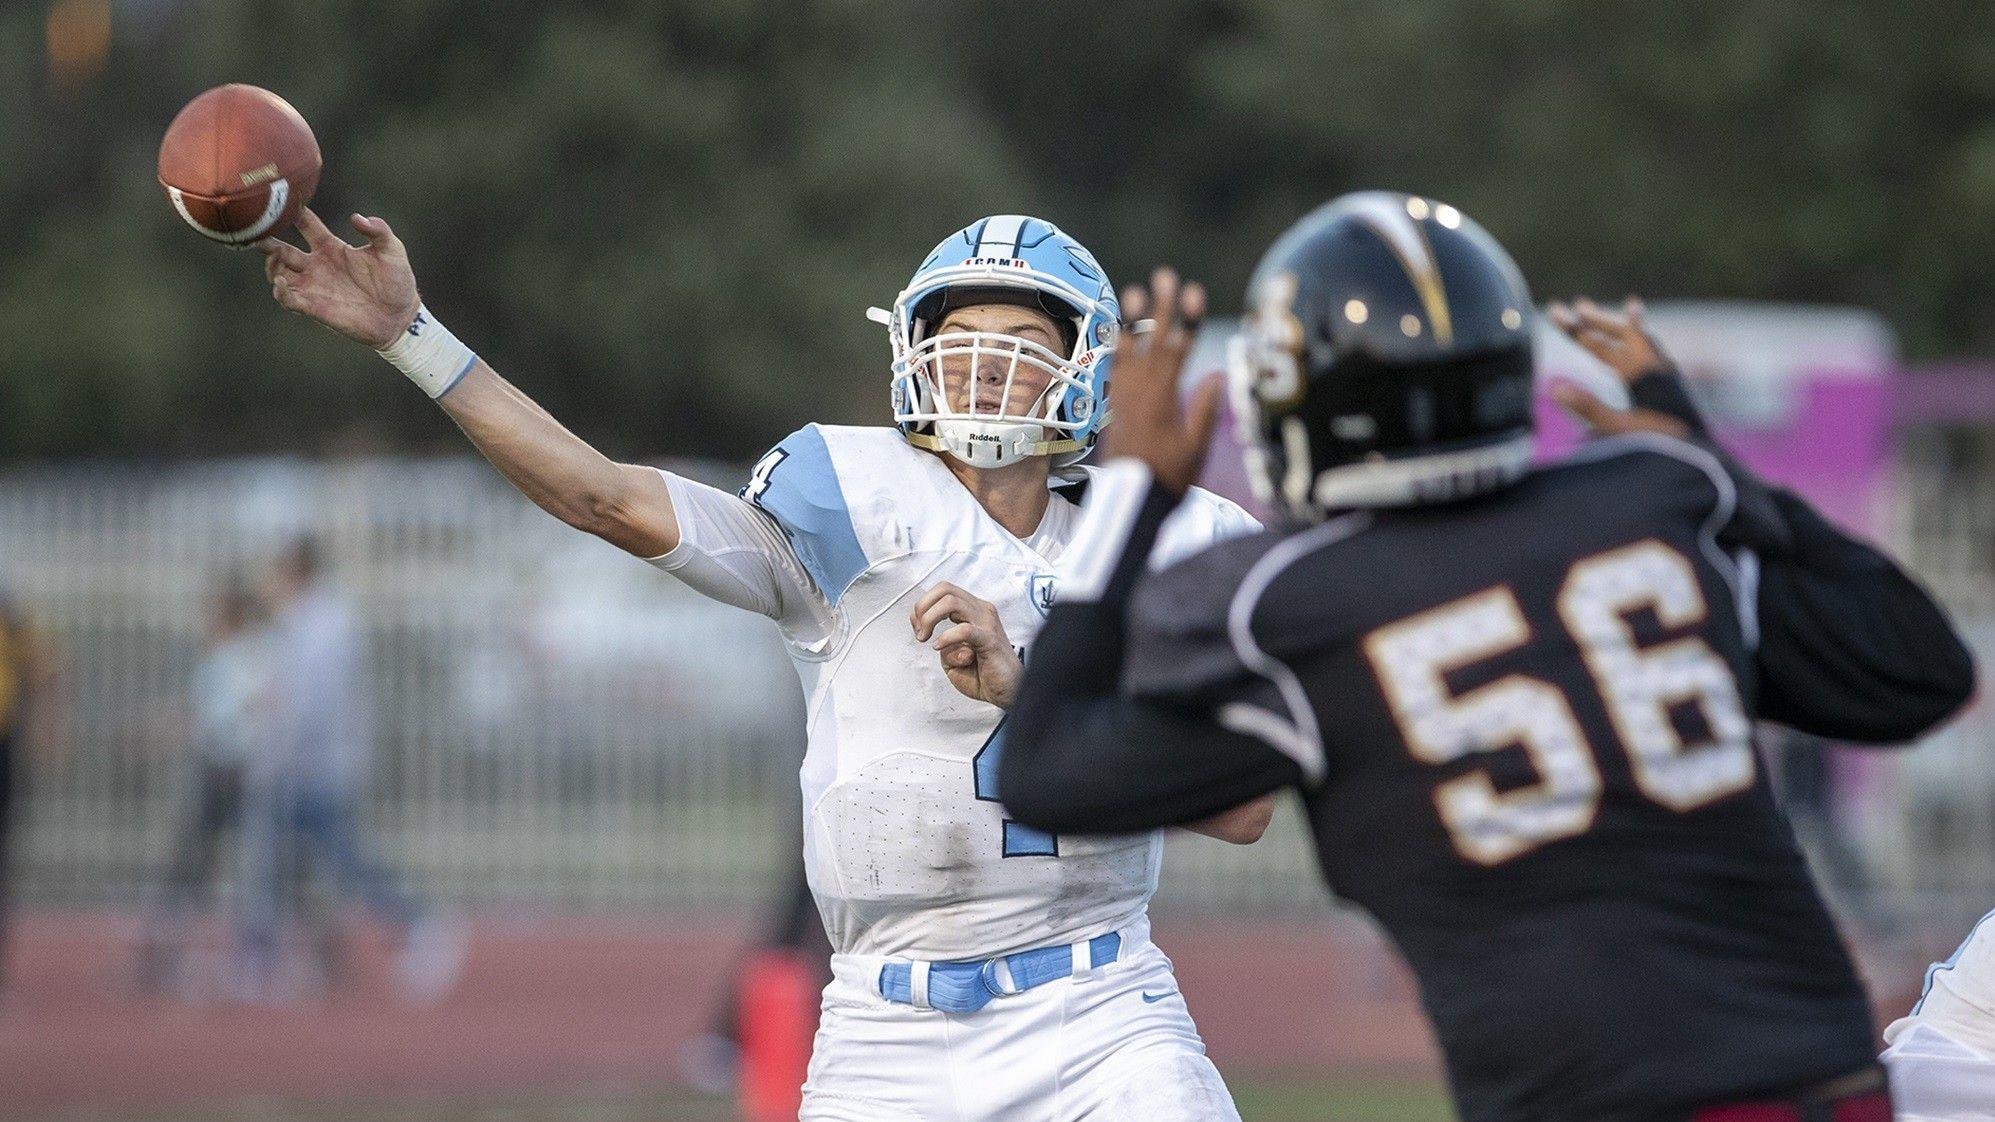 Week 4 High School Football Preview: Corona del Mar vs. San Clemente